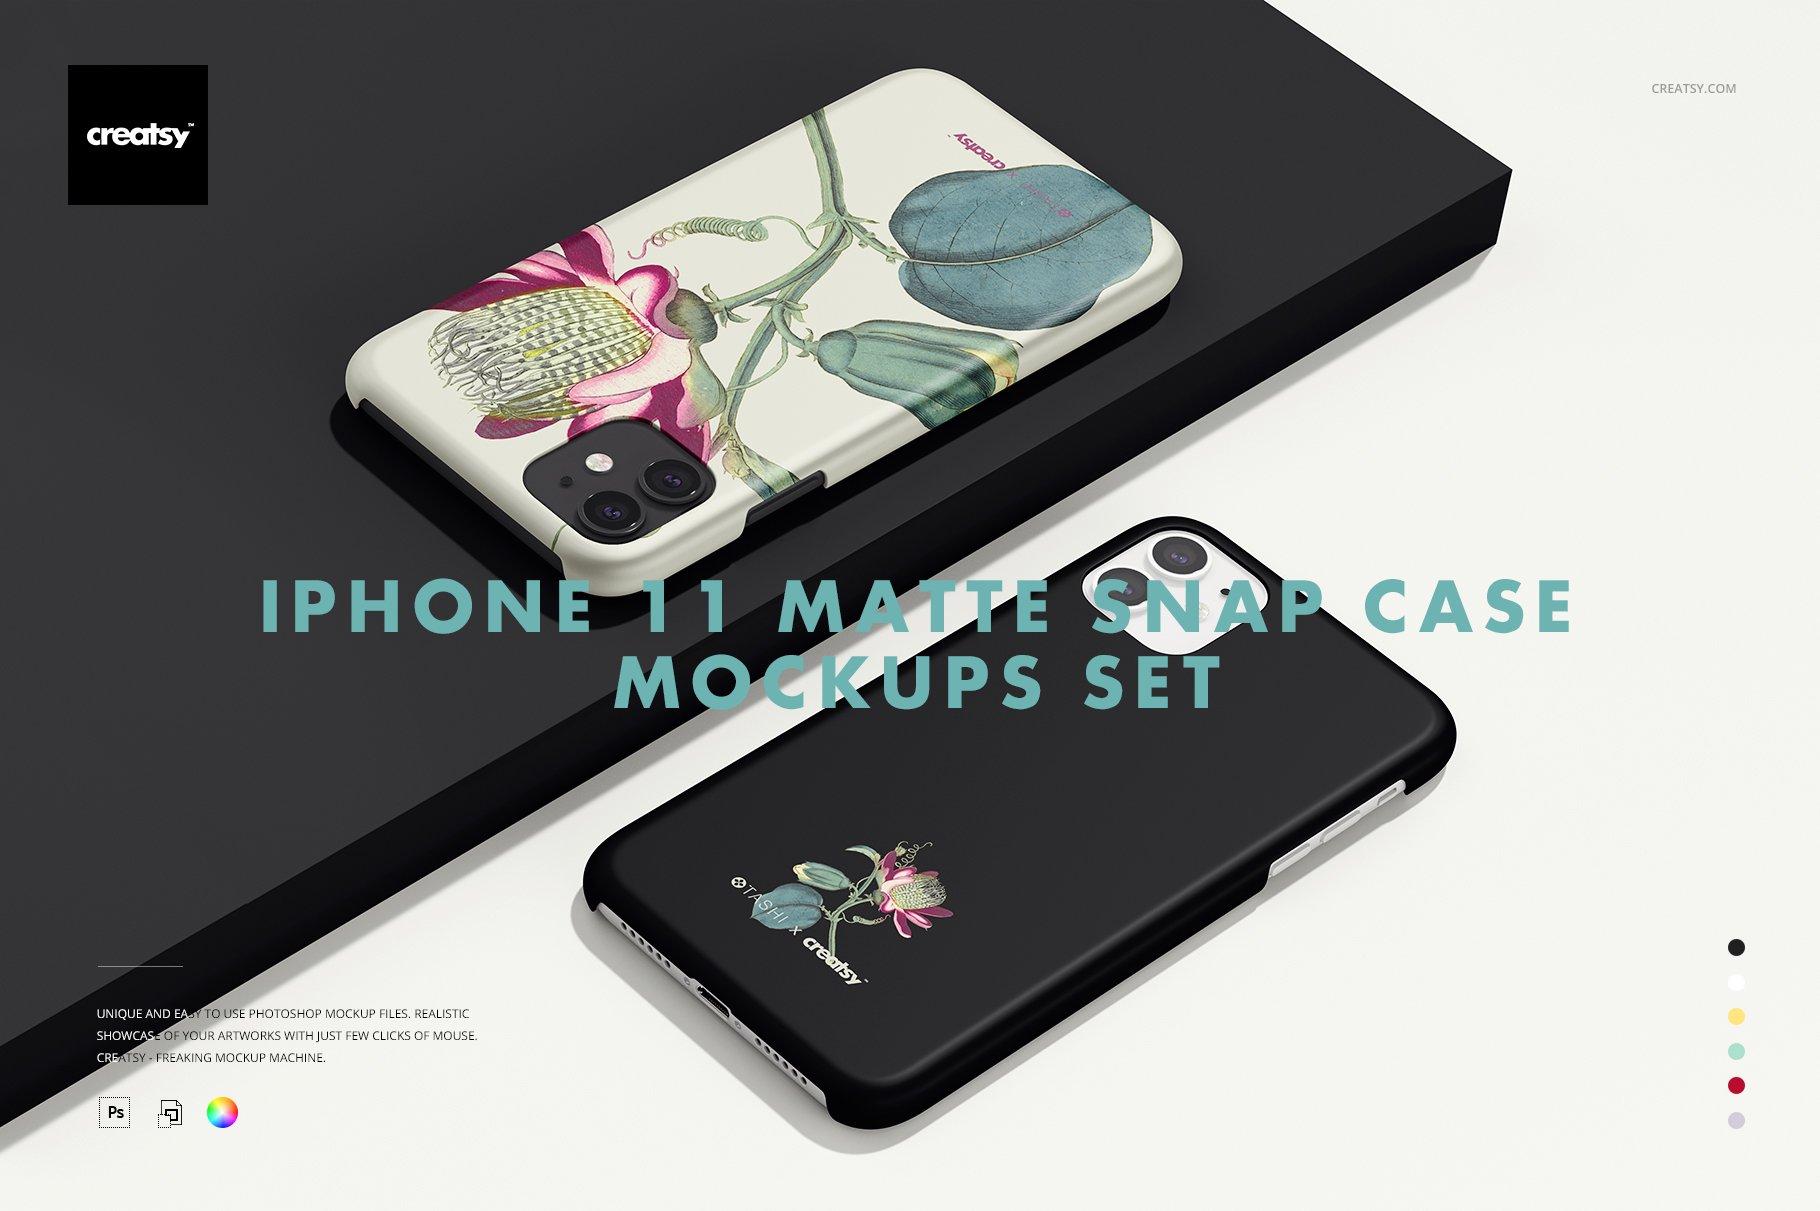 Iphone 11 Matte Snap Case Mockup Set Creative Photoshop Templates Creative Market